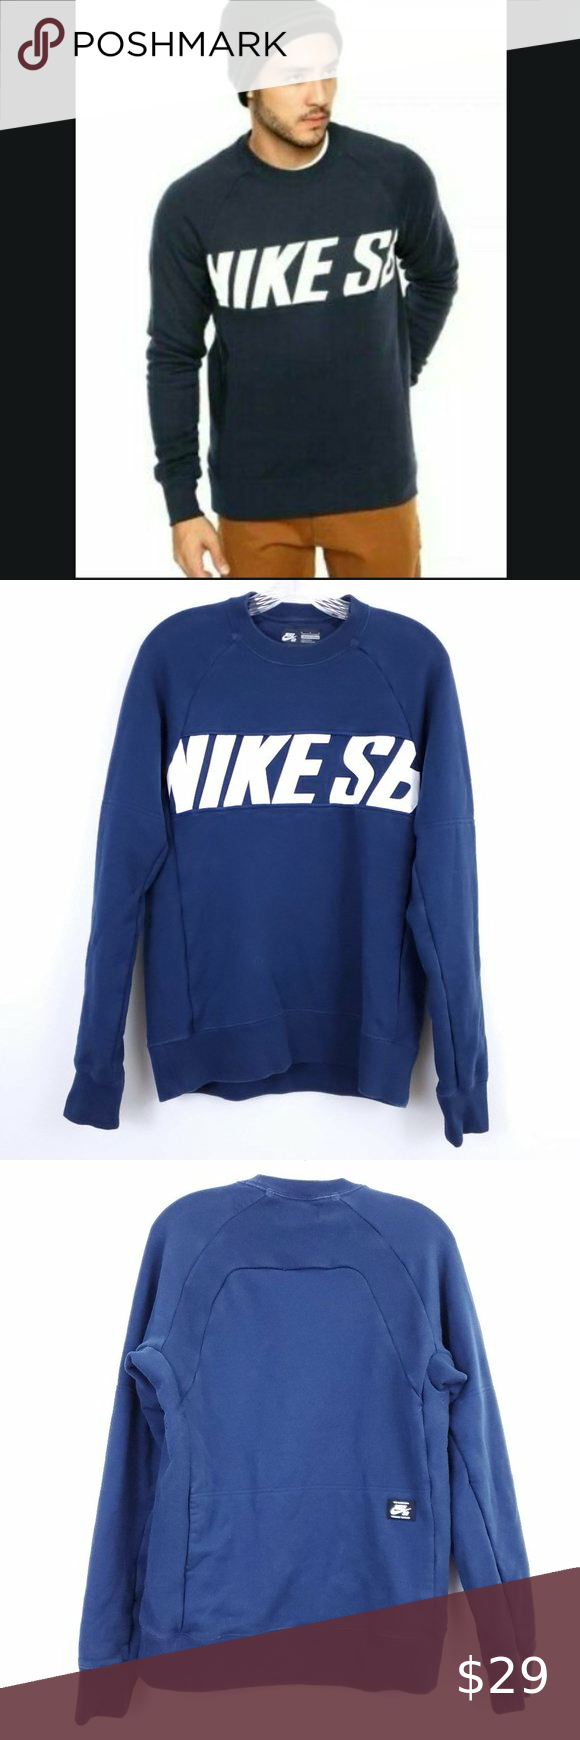 Nike Sb Everett Motion Mustard Crewneck Sweatshirt Urban Outfitters Crew Neck Sweatshirt Sweatshirts Nike Sb [ 1463 x 975 Pixel ]